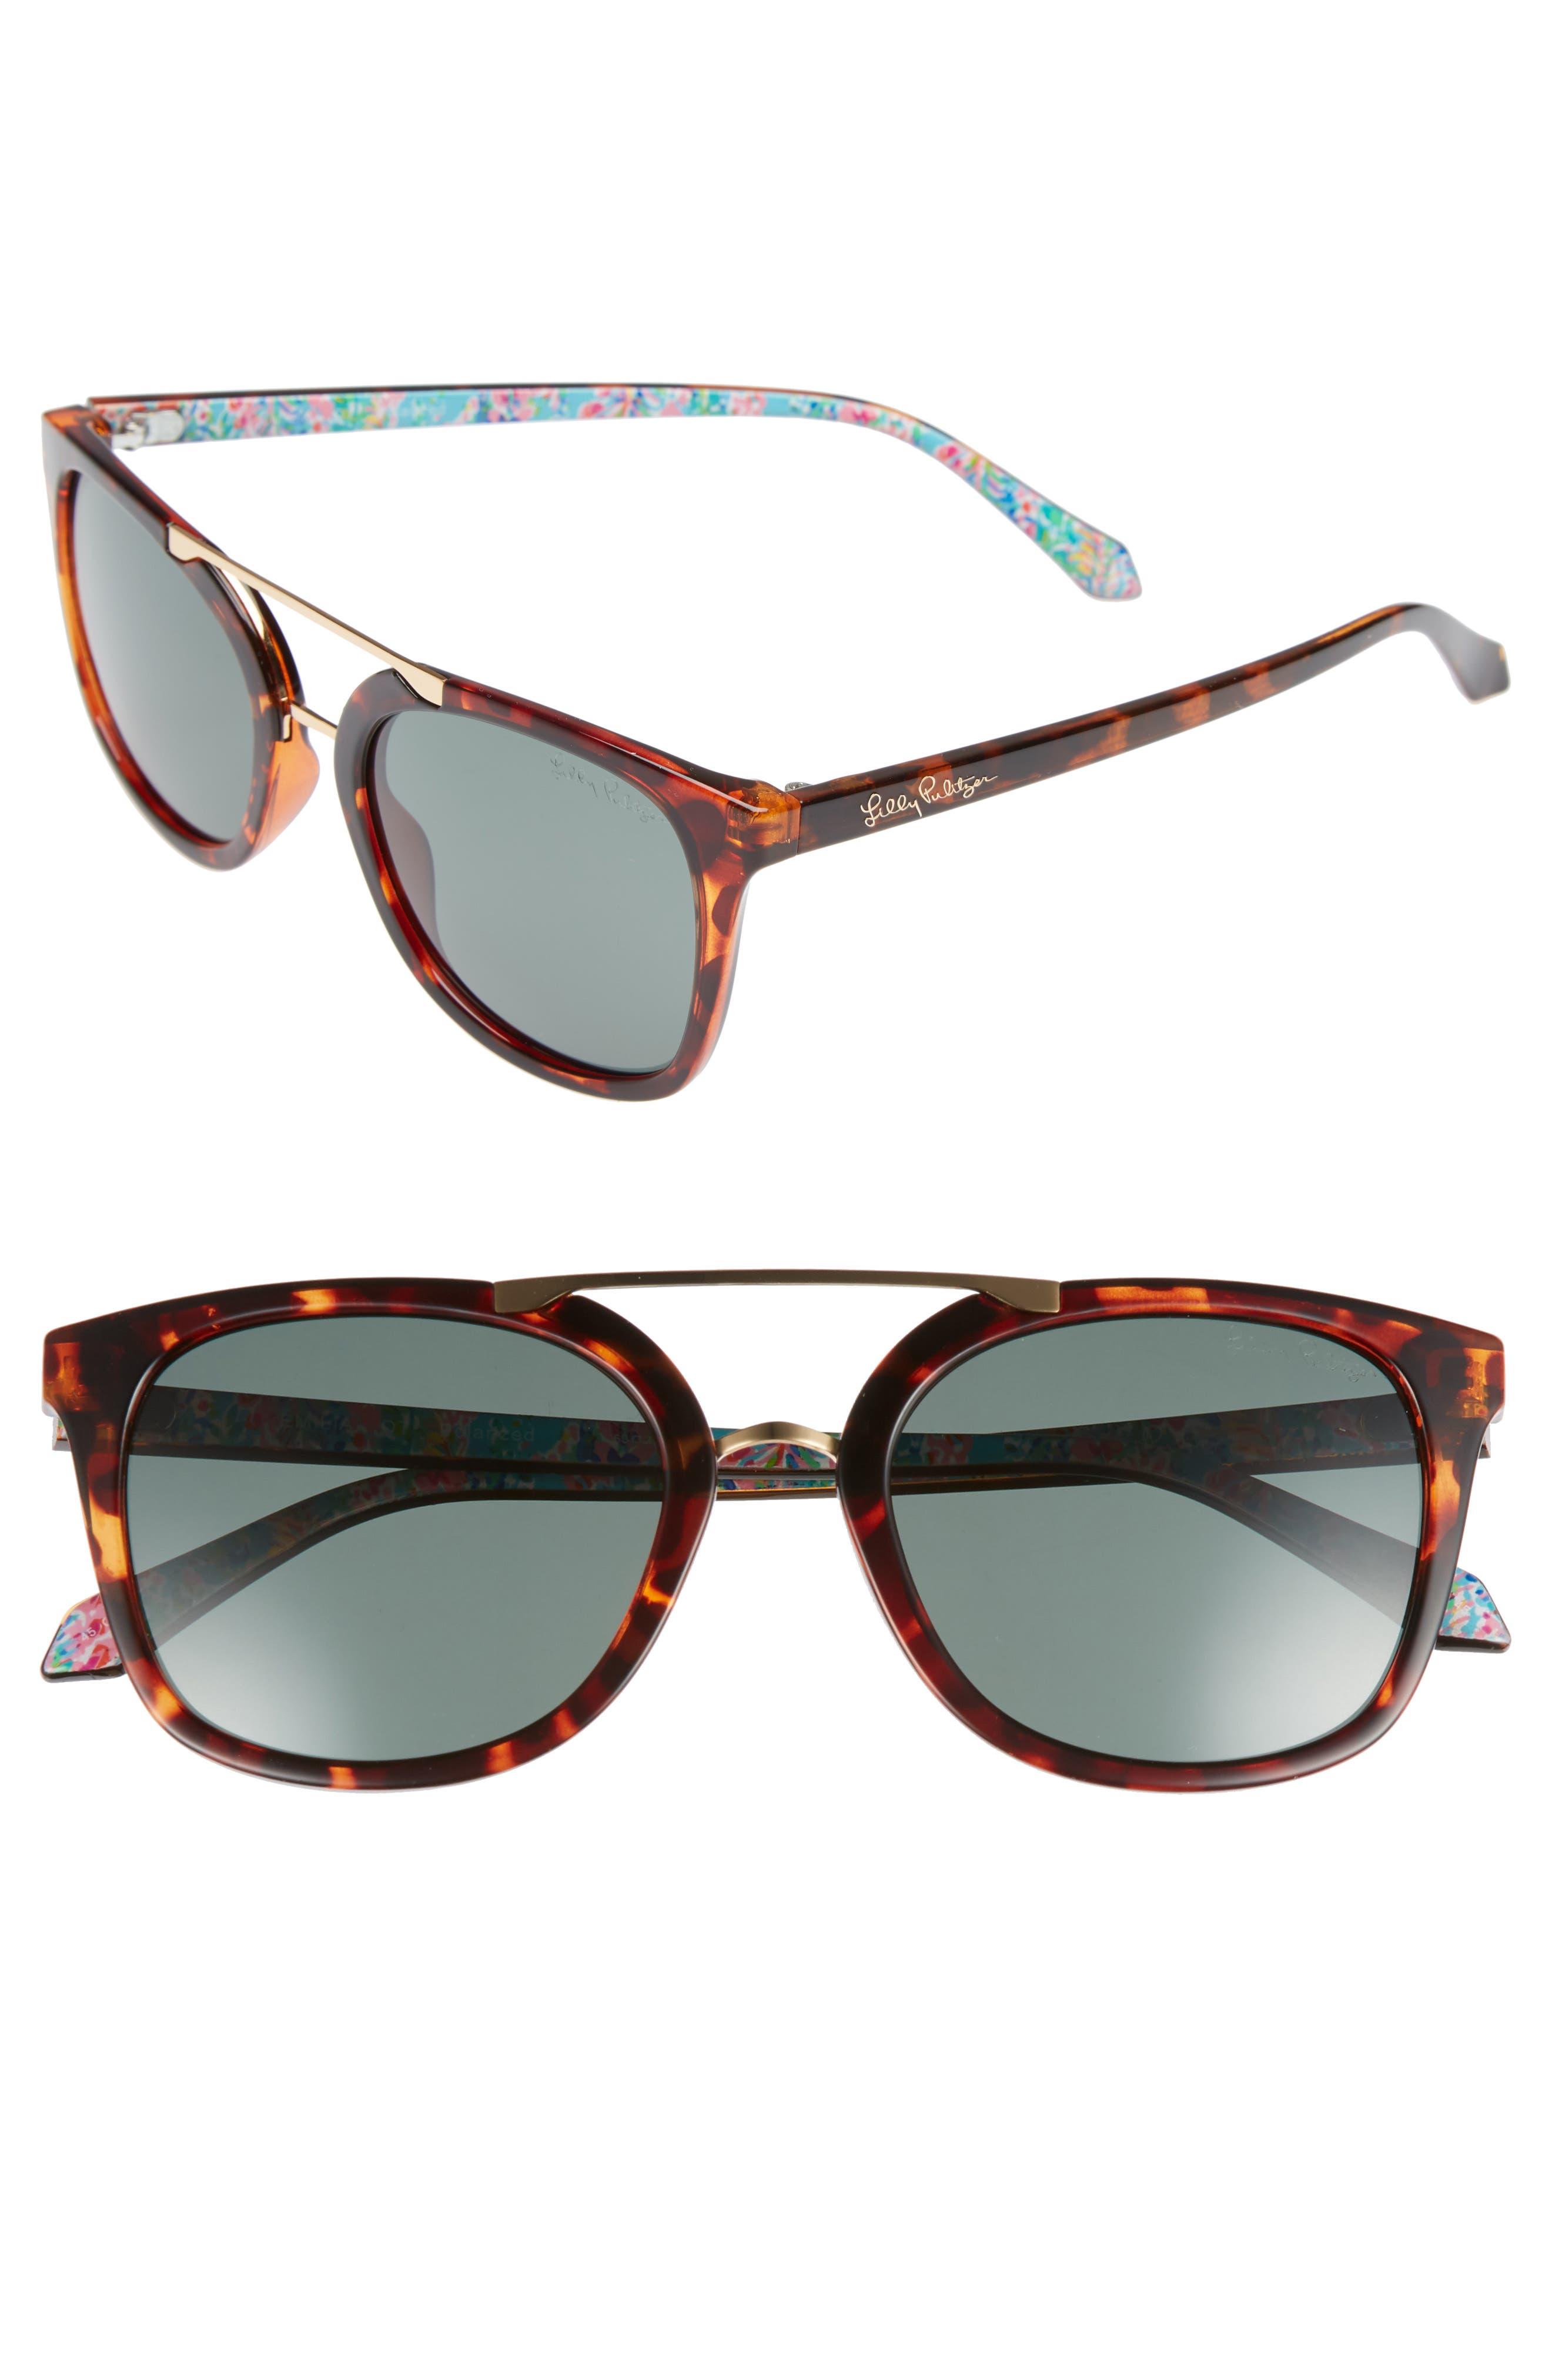 Lilly Pulitzer Emilia 53mm Polarized Sunglasses,                         Main,                         color, DARK TORTOISE/ GREEN